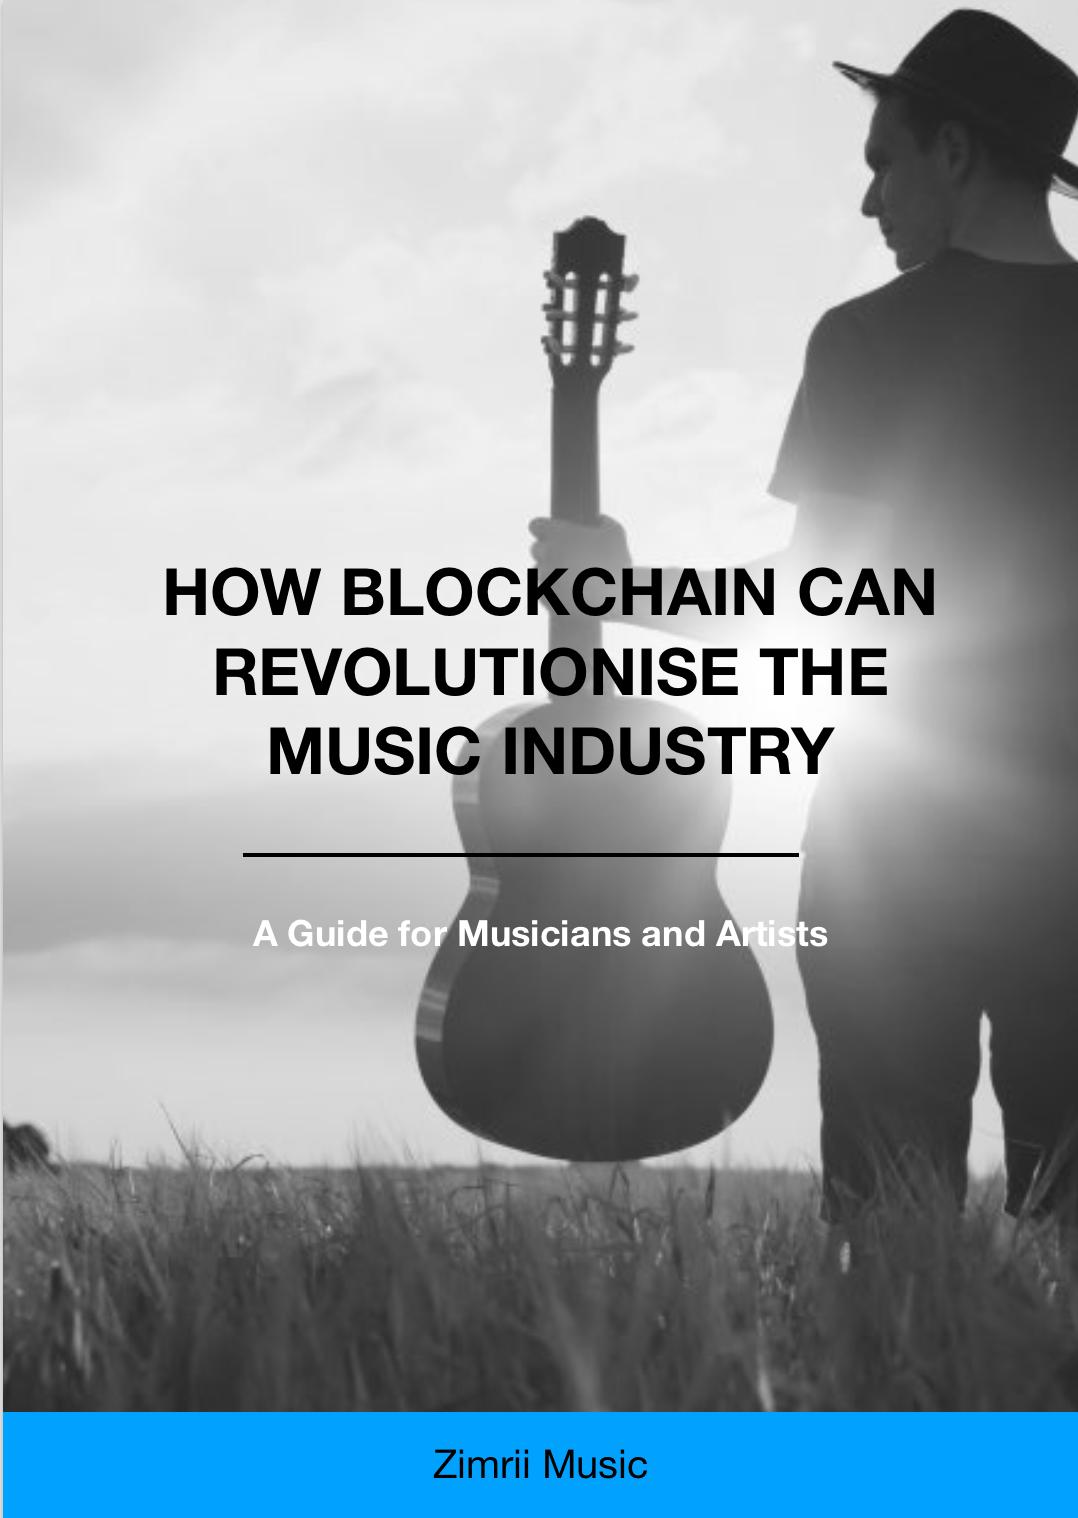 Blockchain Ebook Image